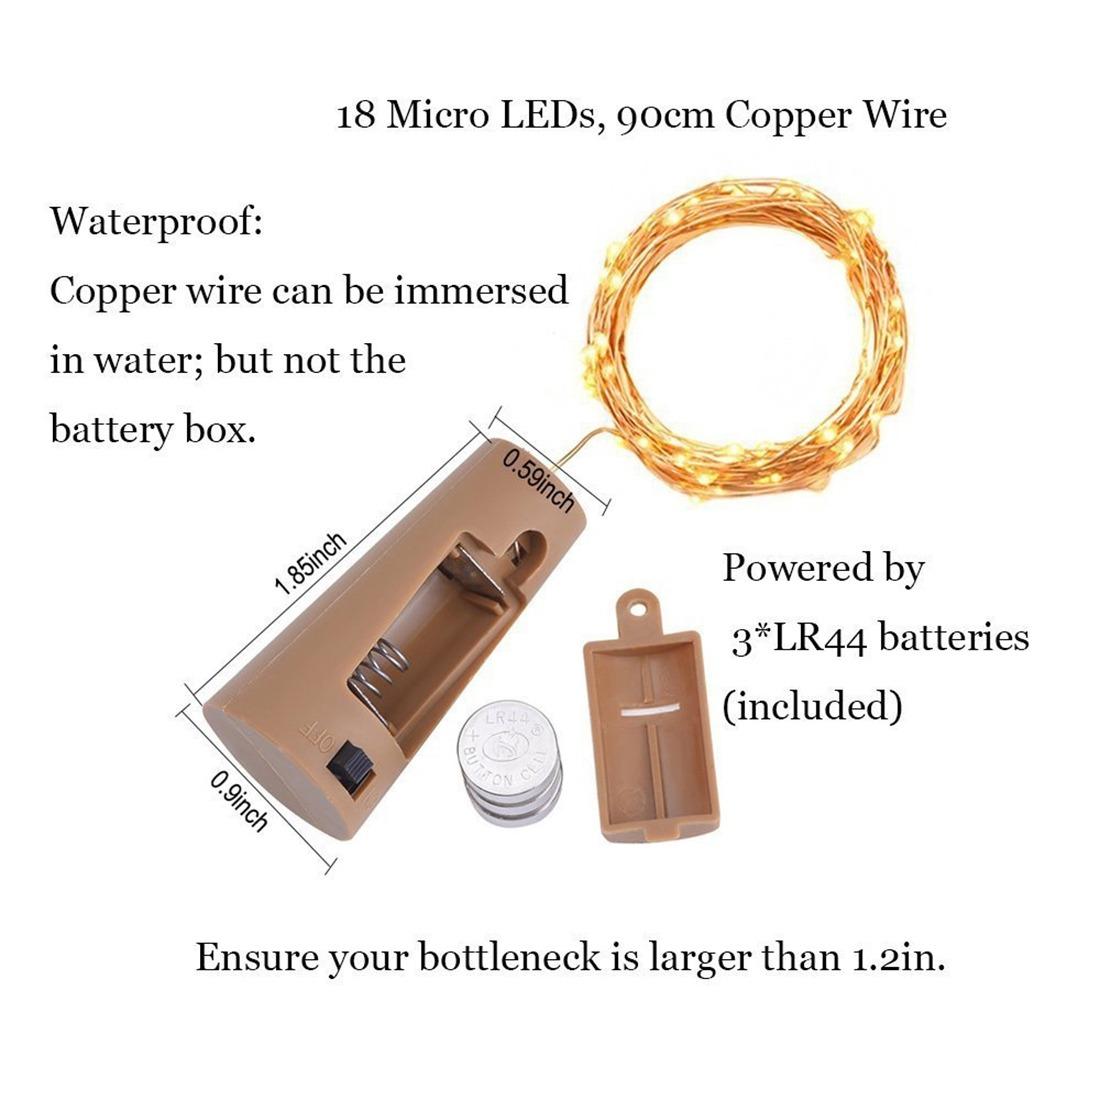 1e320ea7a90 6 pcs 18 led impermeable mini botella cork cobre cadena luz. Cargando zoom.